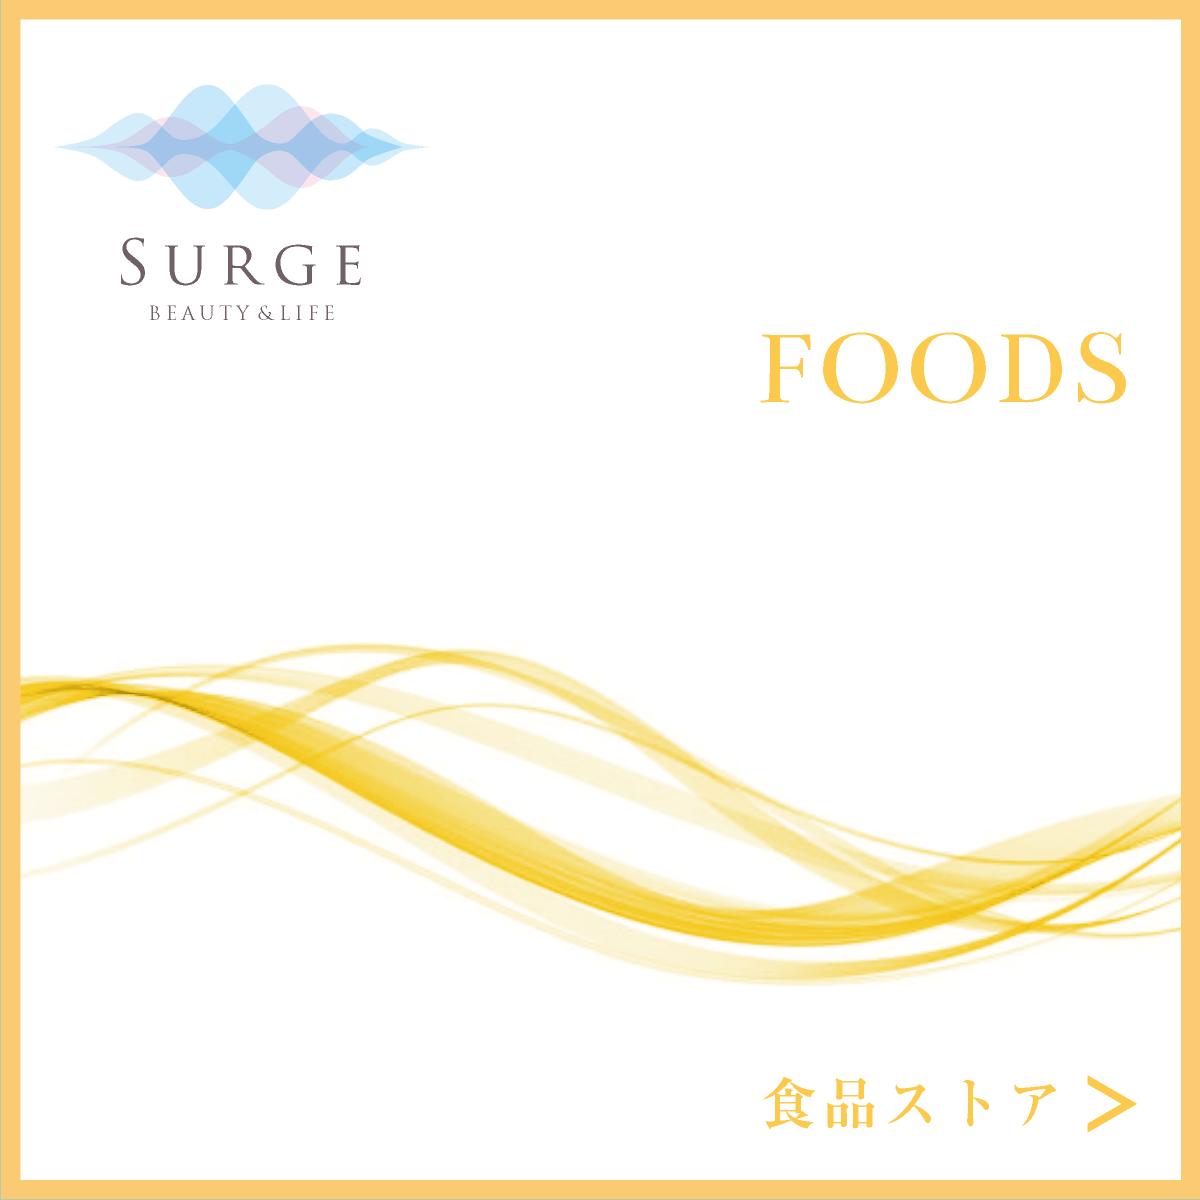 FOODS・食品ストア_Surge・株式会社サージ| 兵庫県神戸市|美容・コスメ・日用品・食品|卸売・総合商社| 美容サロン様への商品提案・コンサルタント|会員向けショップ運営